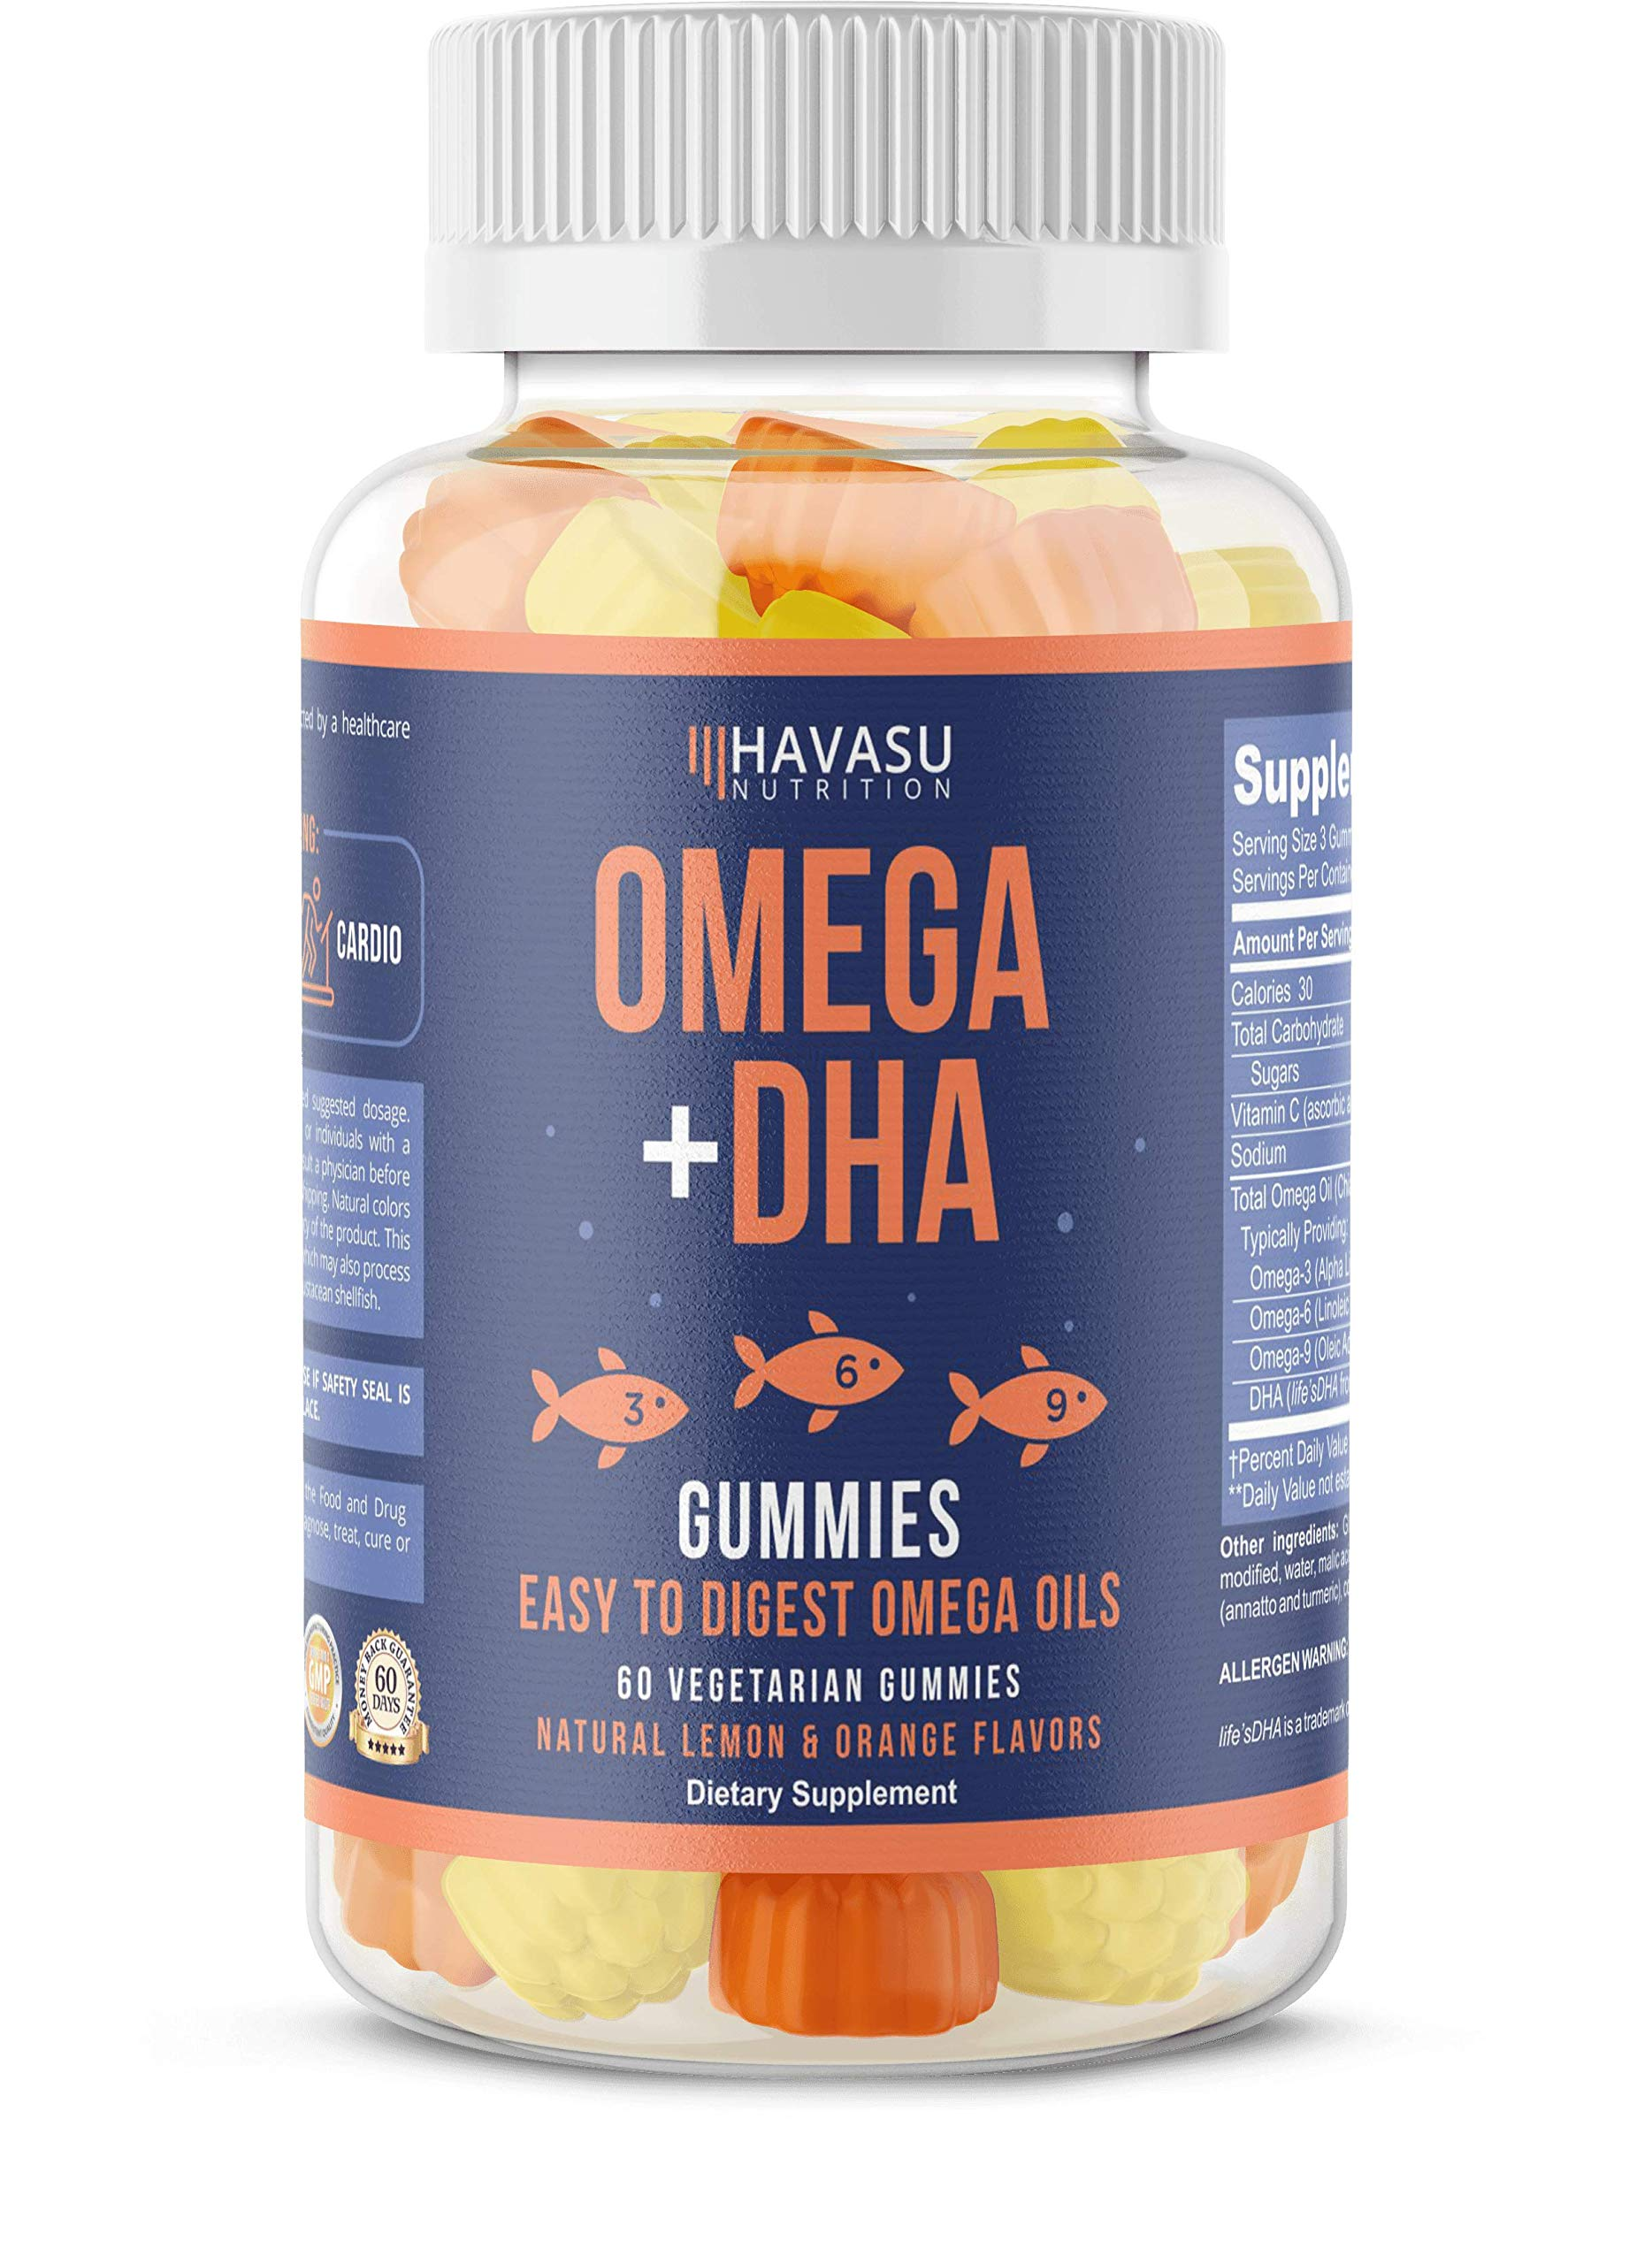 Havasu Nutrition Omega + DHA Gummies to Support Brain, Joint & Cardiovascular Health - Aids Vision and Immune Health, Non-GMO, Gelatin-Free, Plant Based Oils, Natural Flavors, 60 Vegetable Gummies by Havasu Nutrition